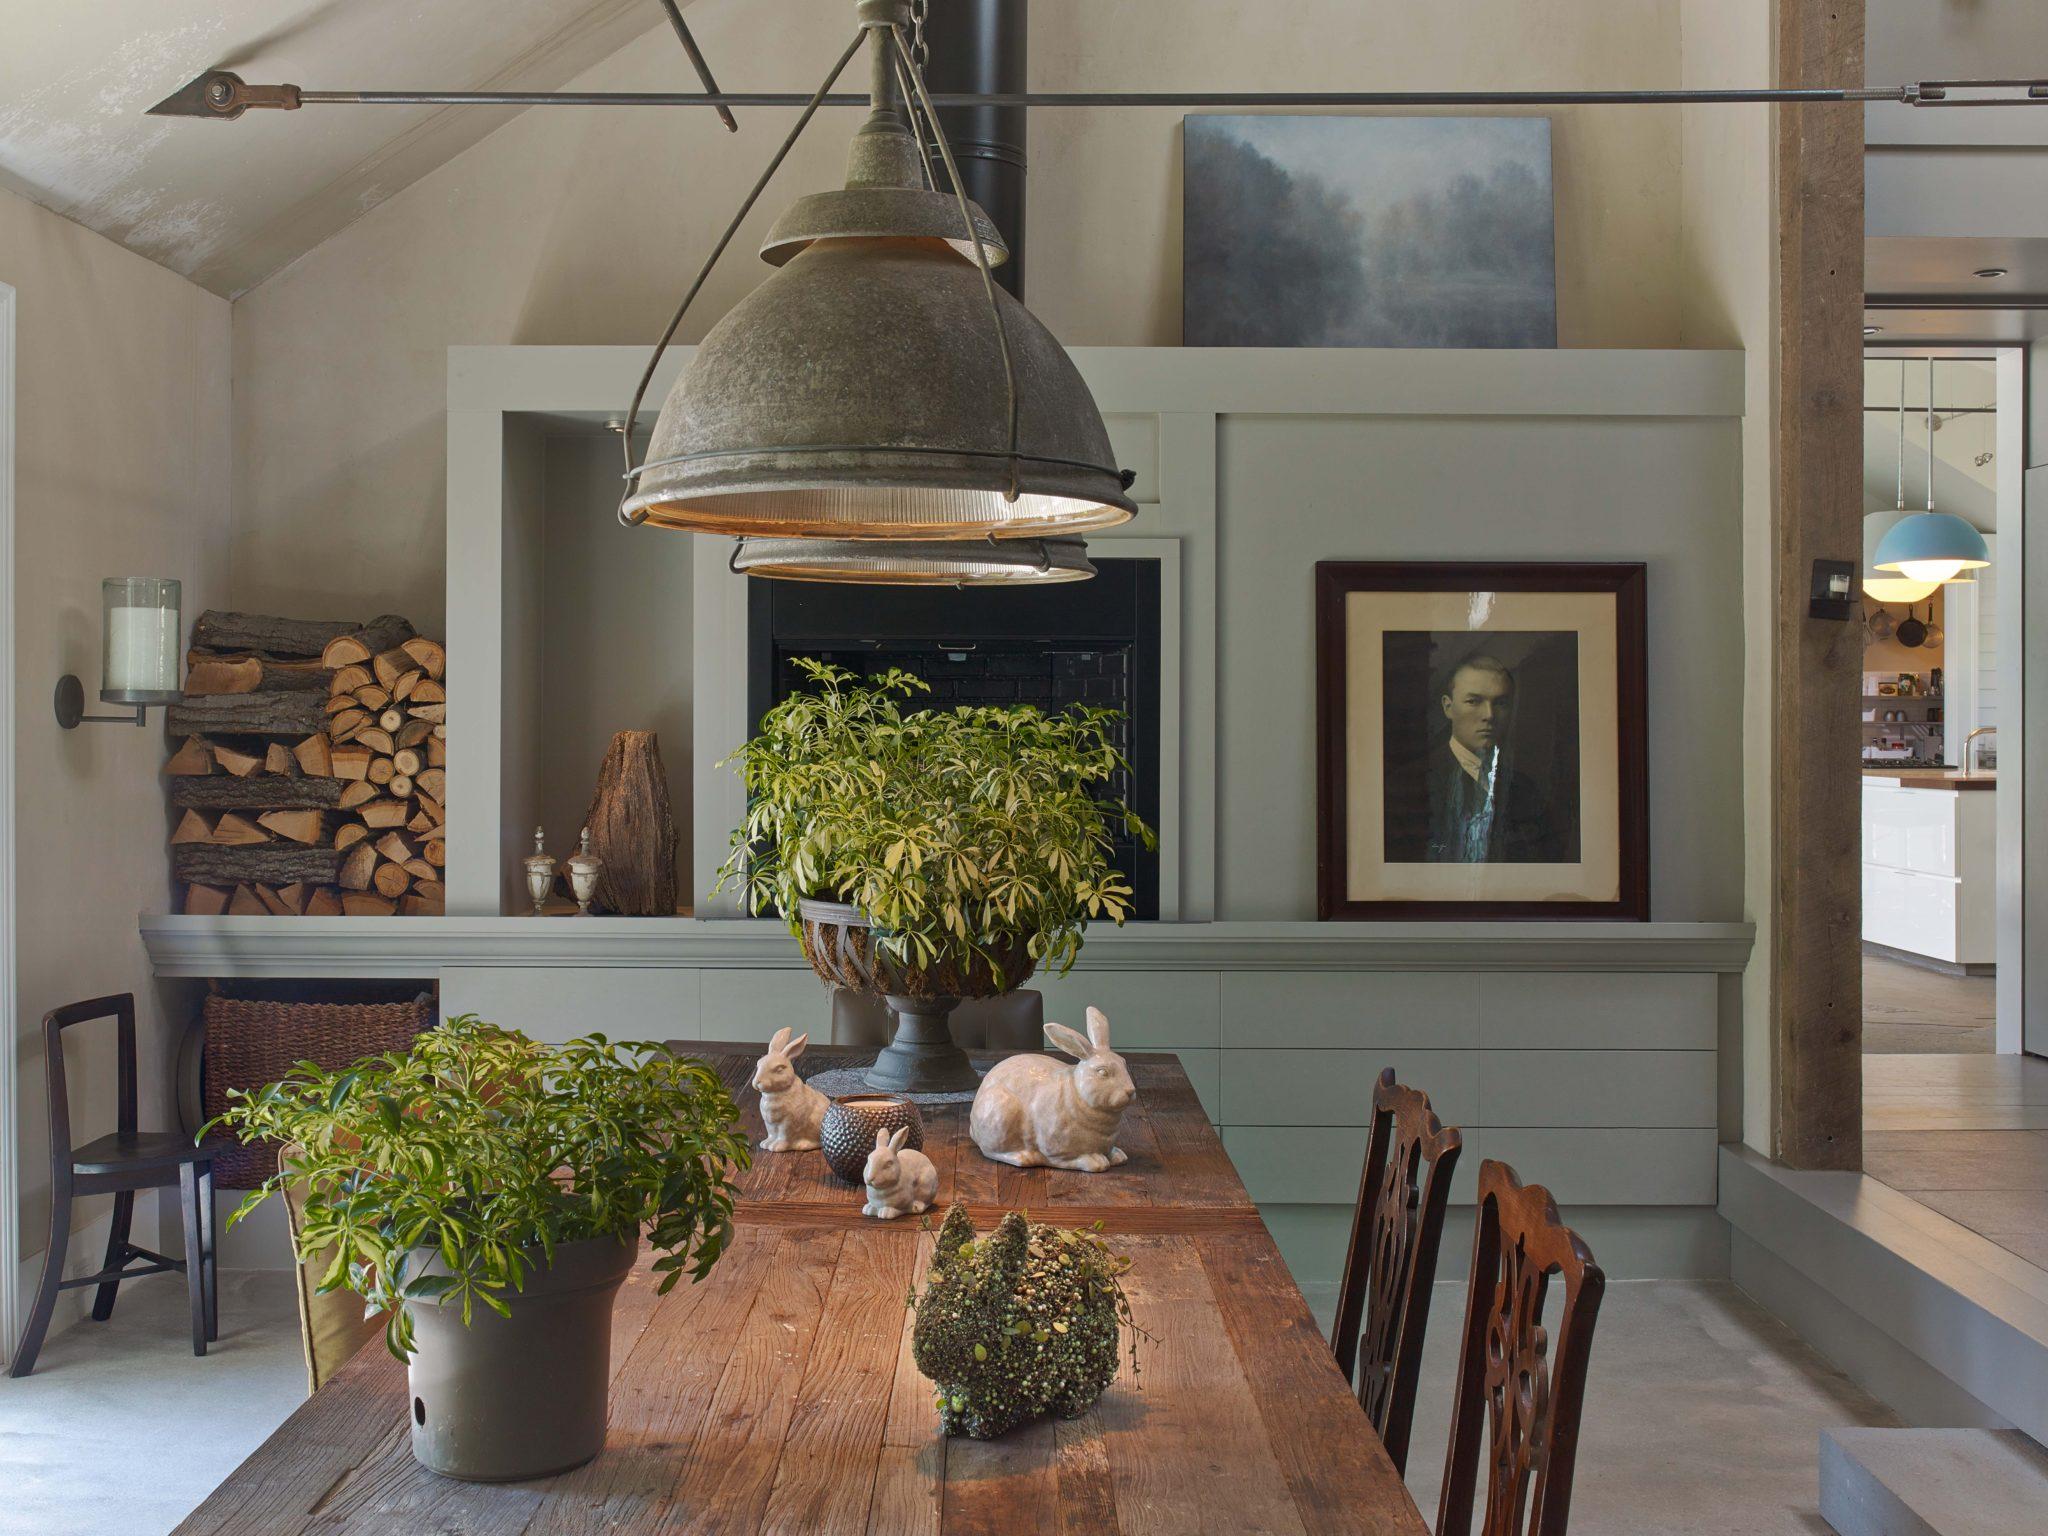 Bucks County, PA. Residence by Laura Bohn Design Associates